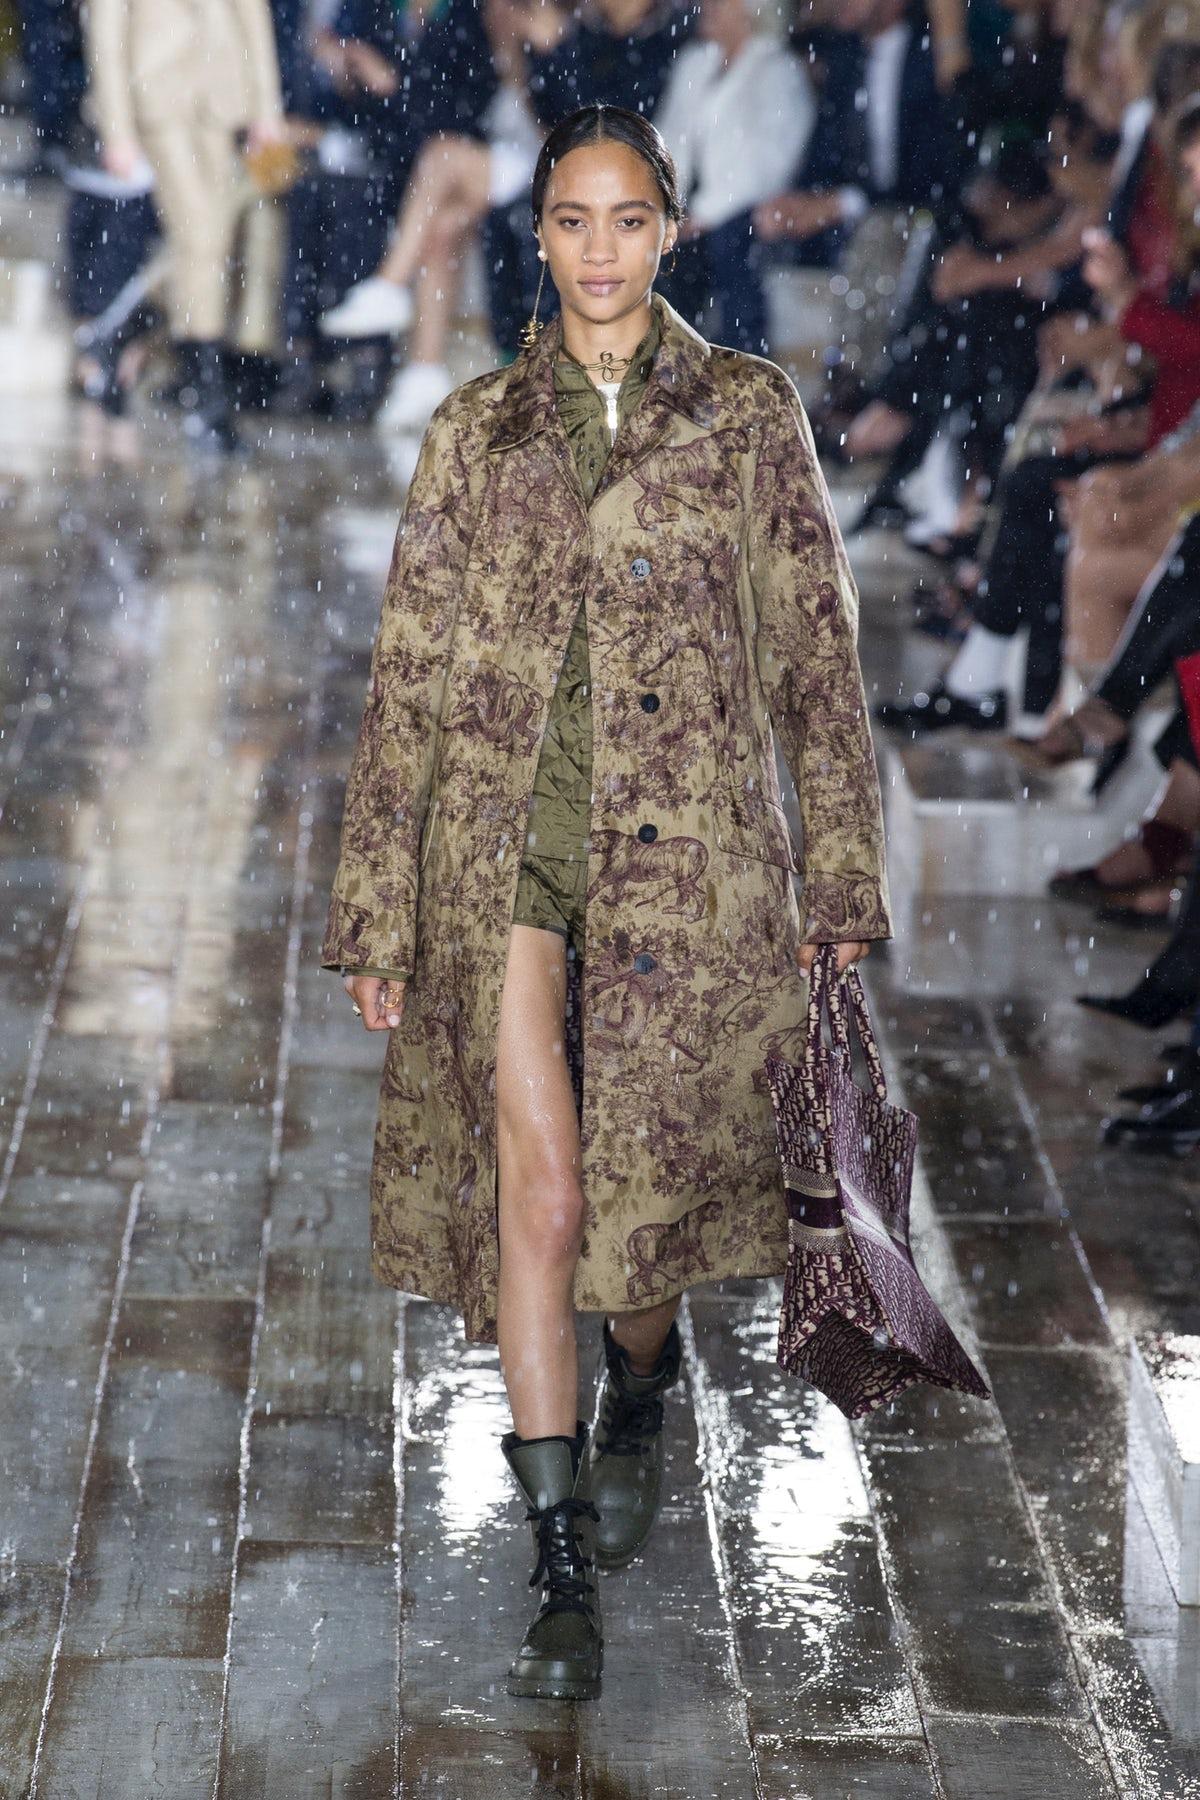 Dior's Haute Tomboys